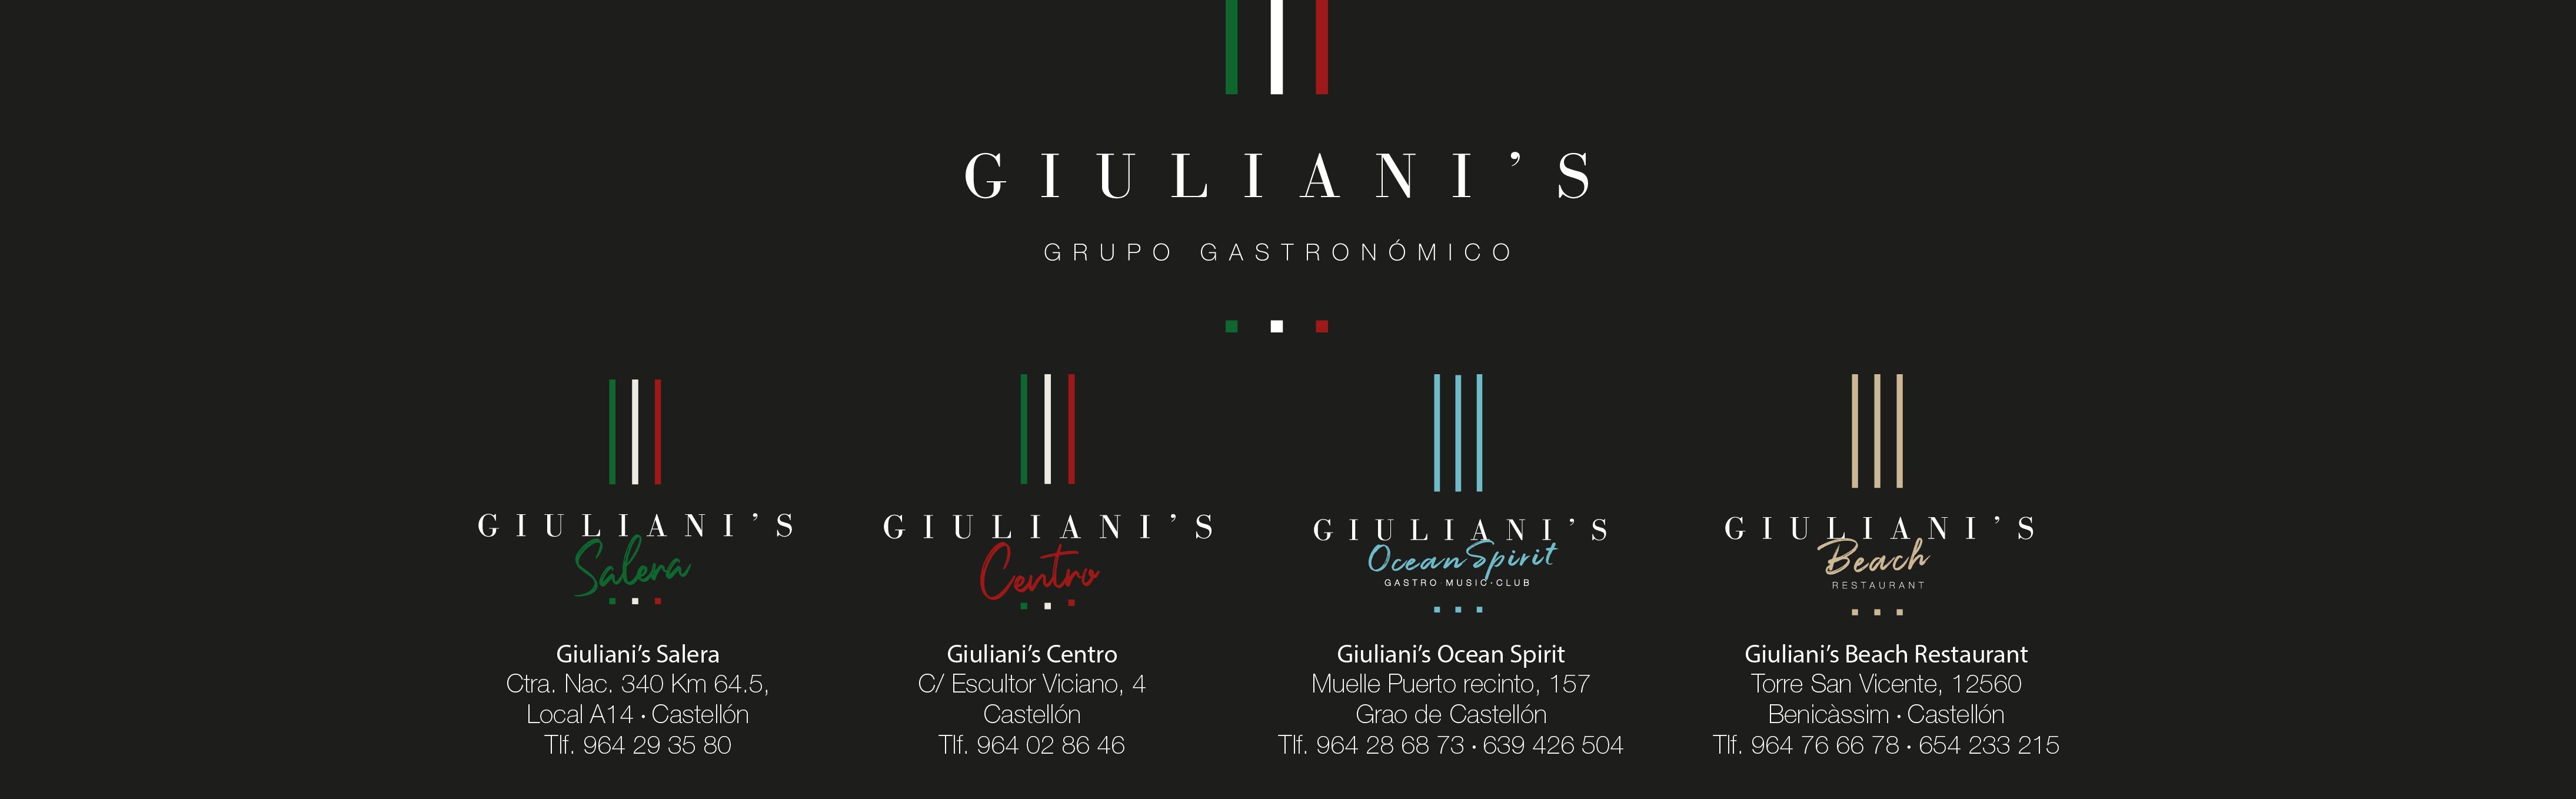 Giuliani's Grupo Gastronómico